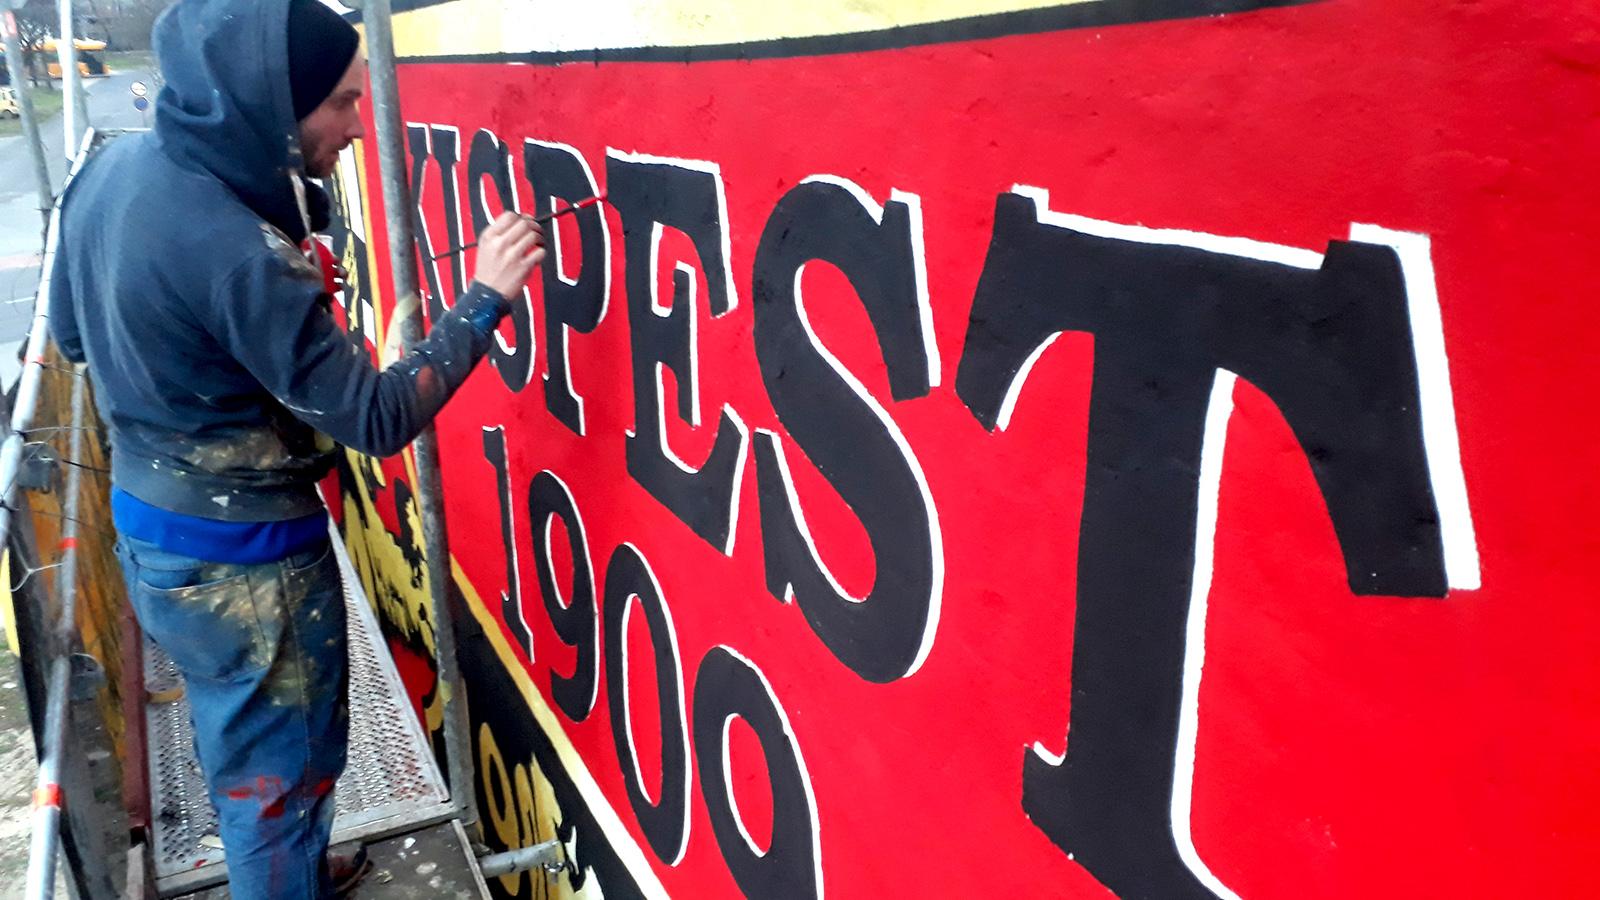 Kispest graffiti - neopaint works